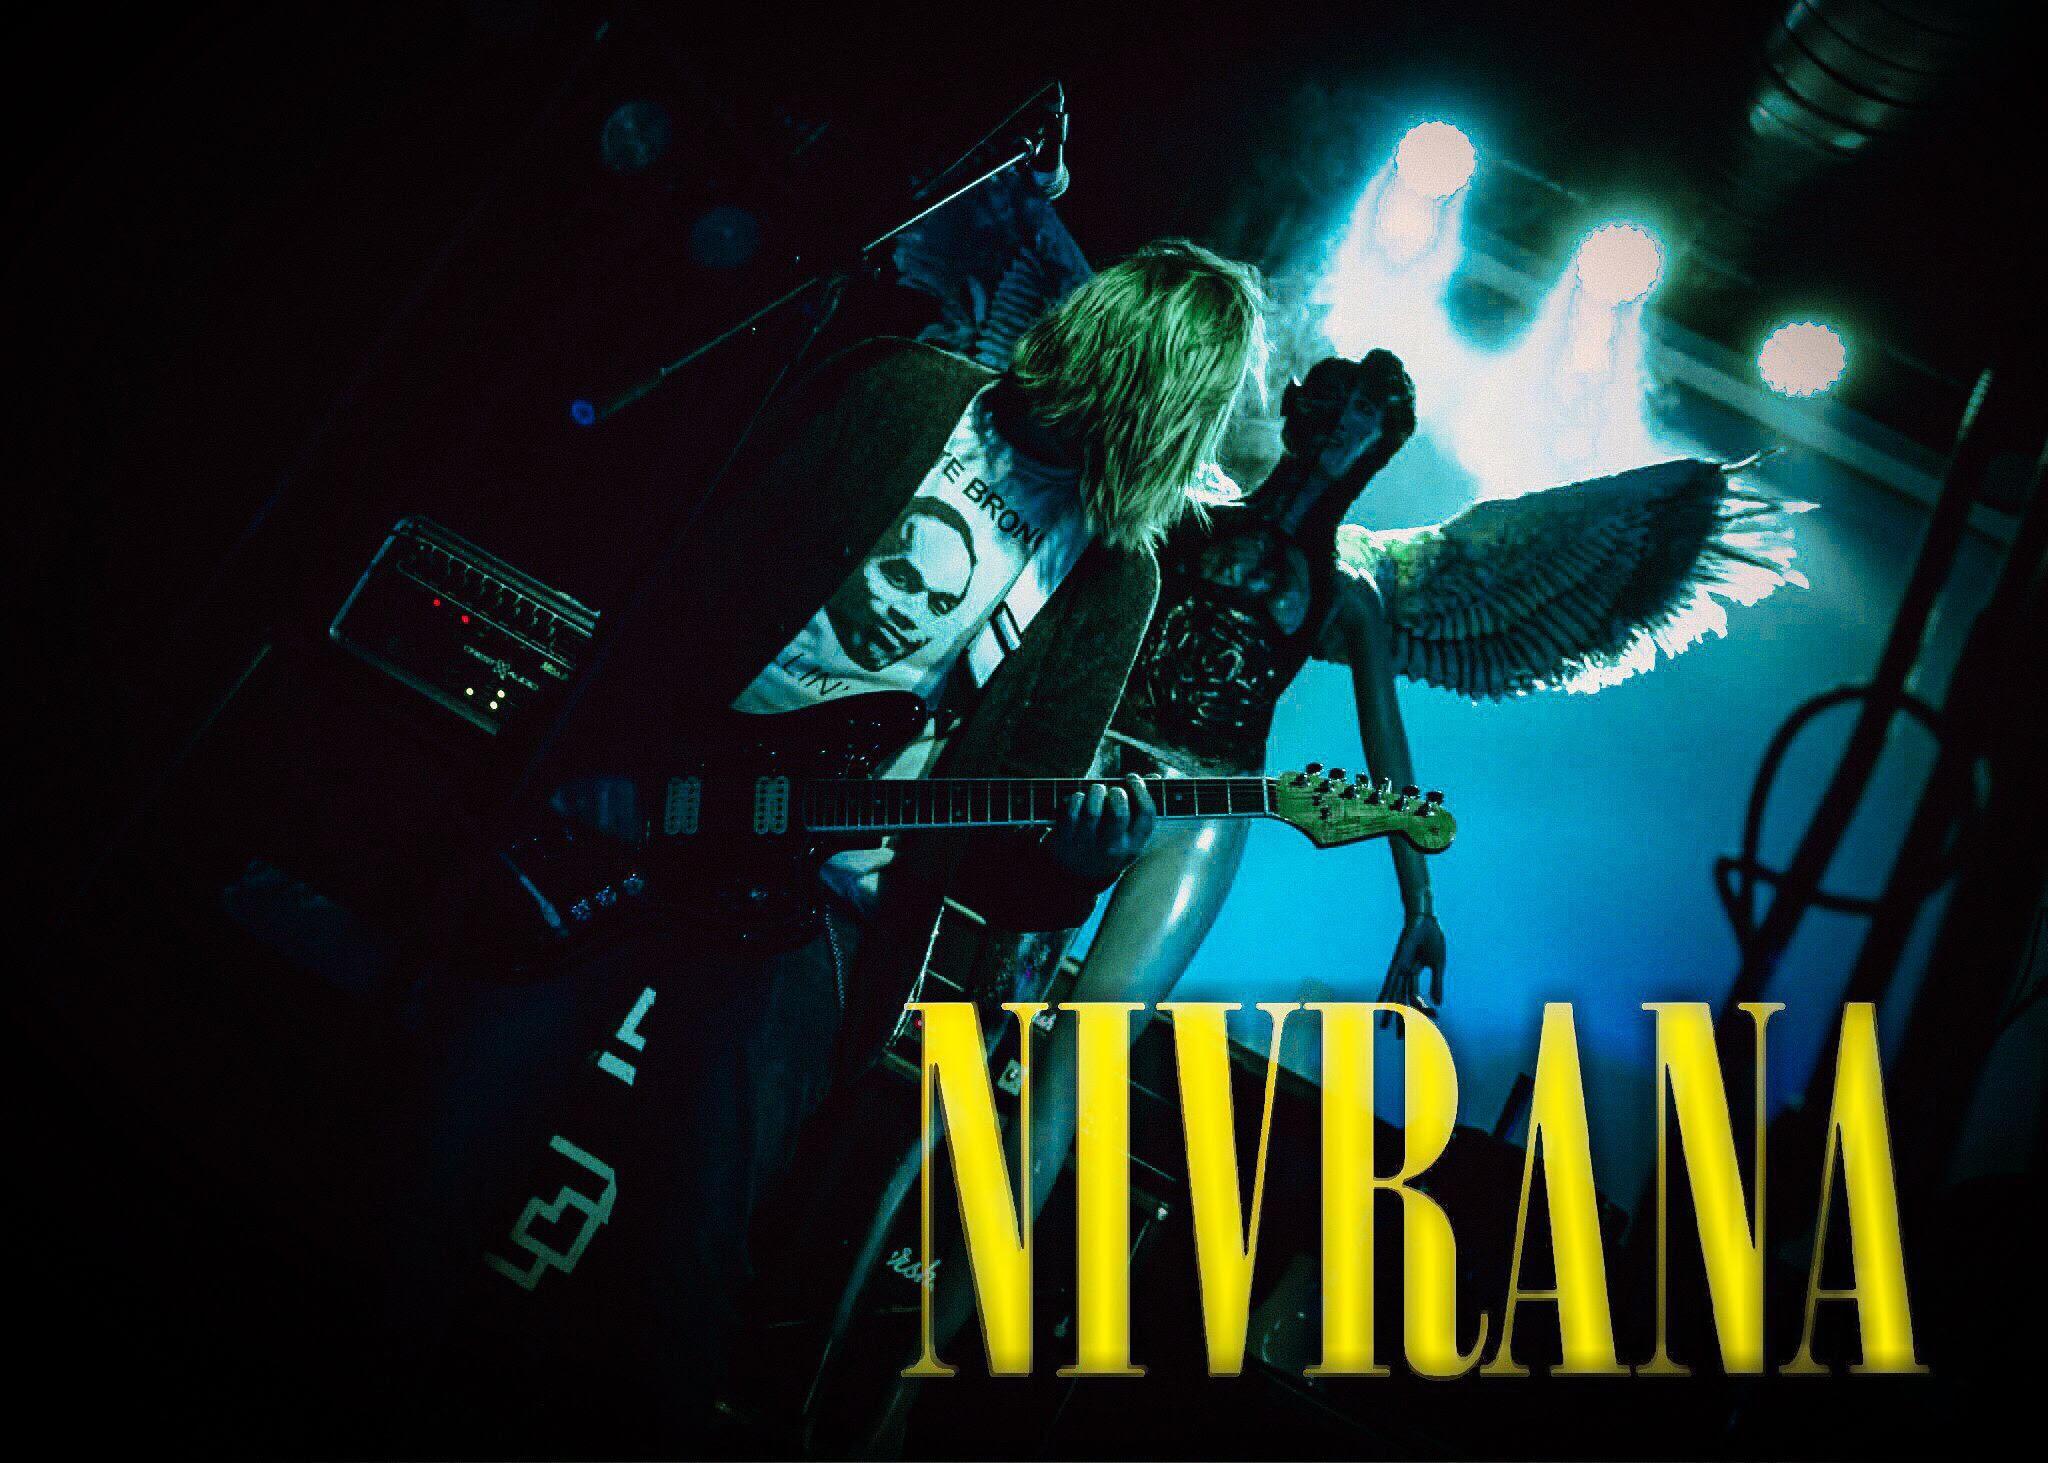 nivrana nirvana tribute band for hire